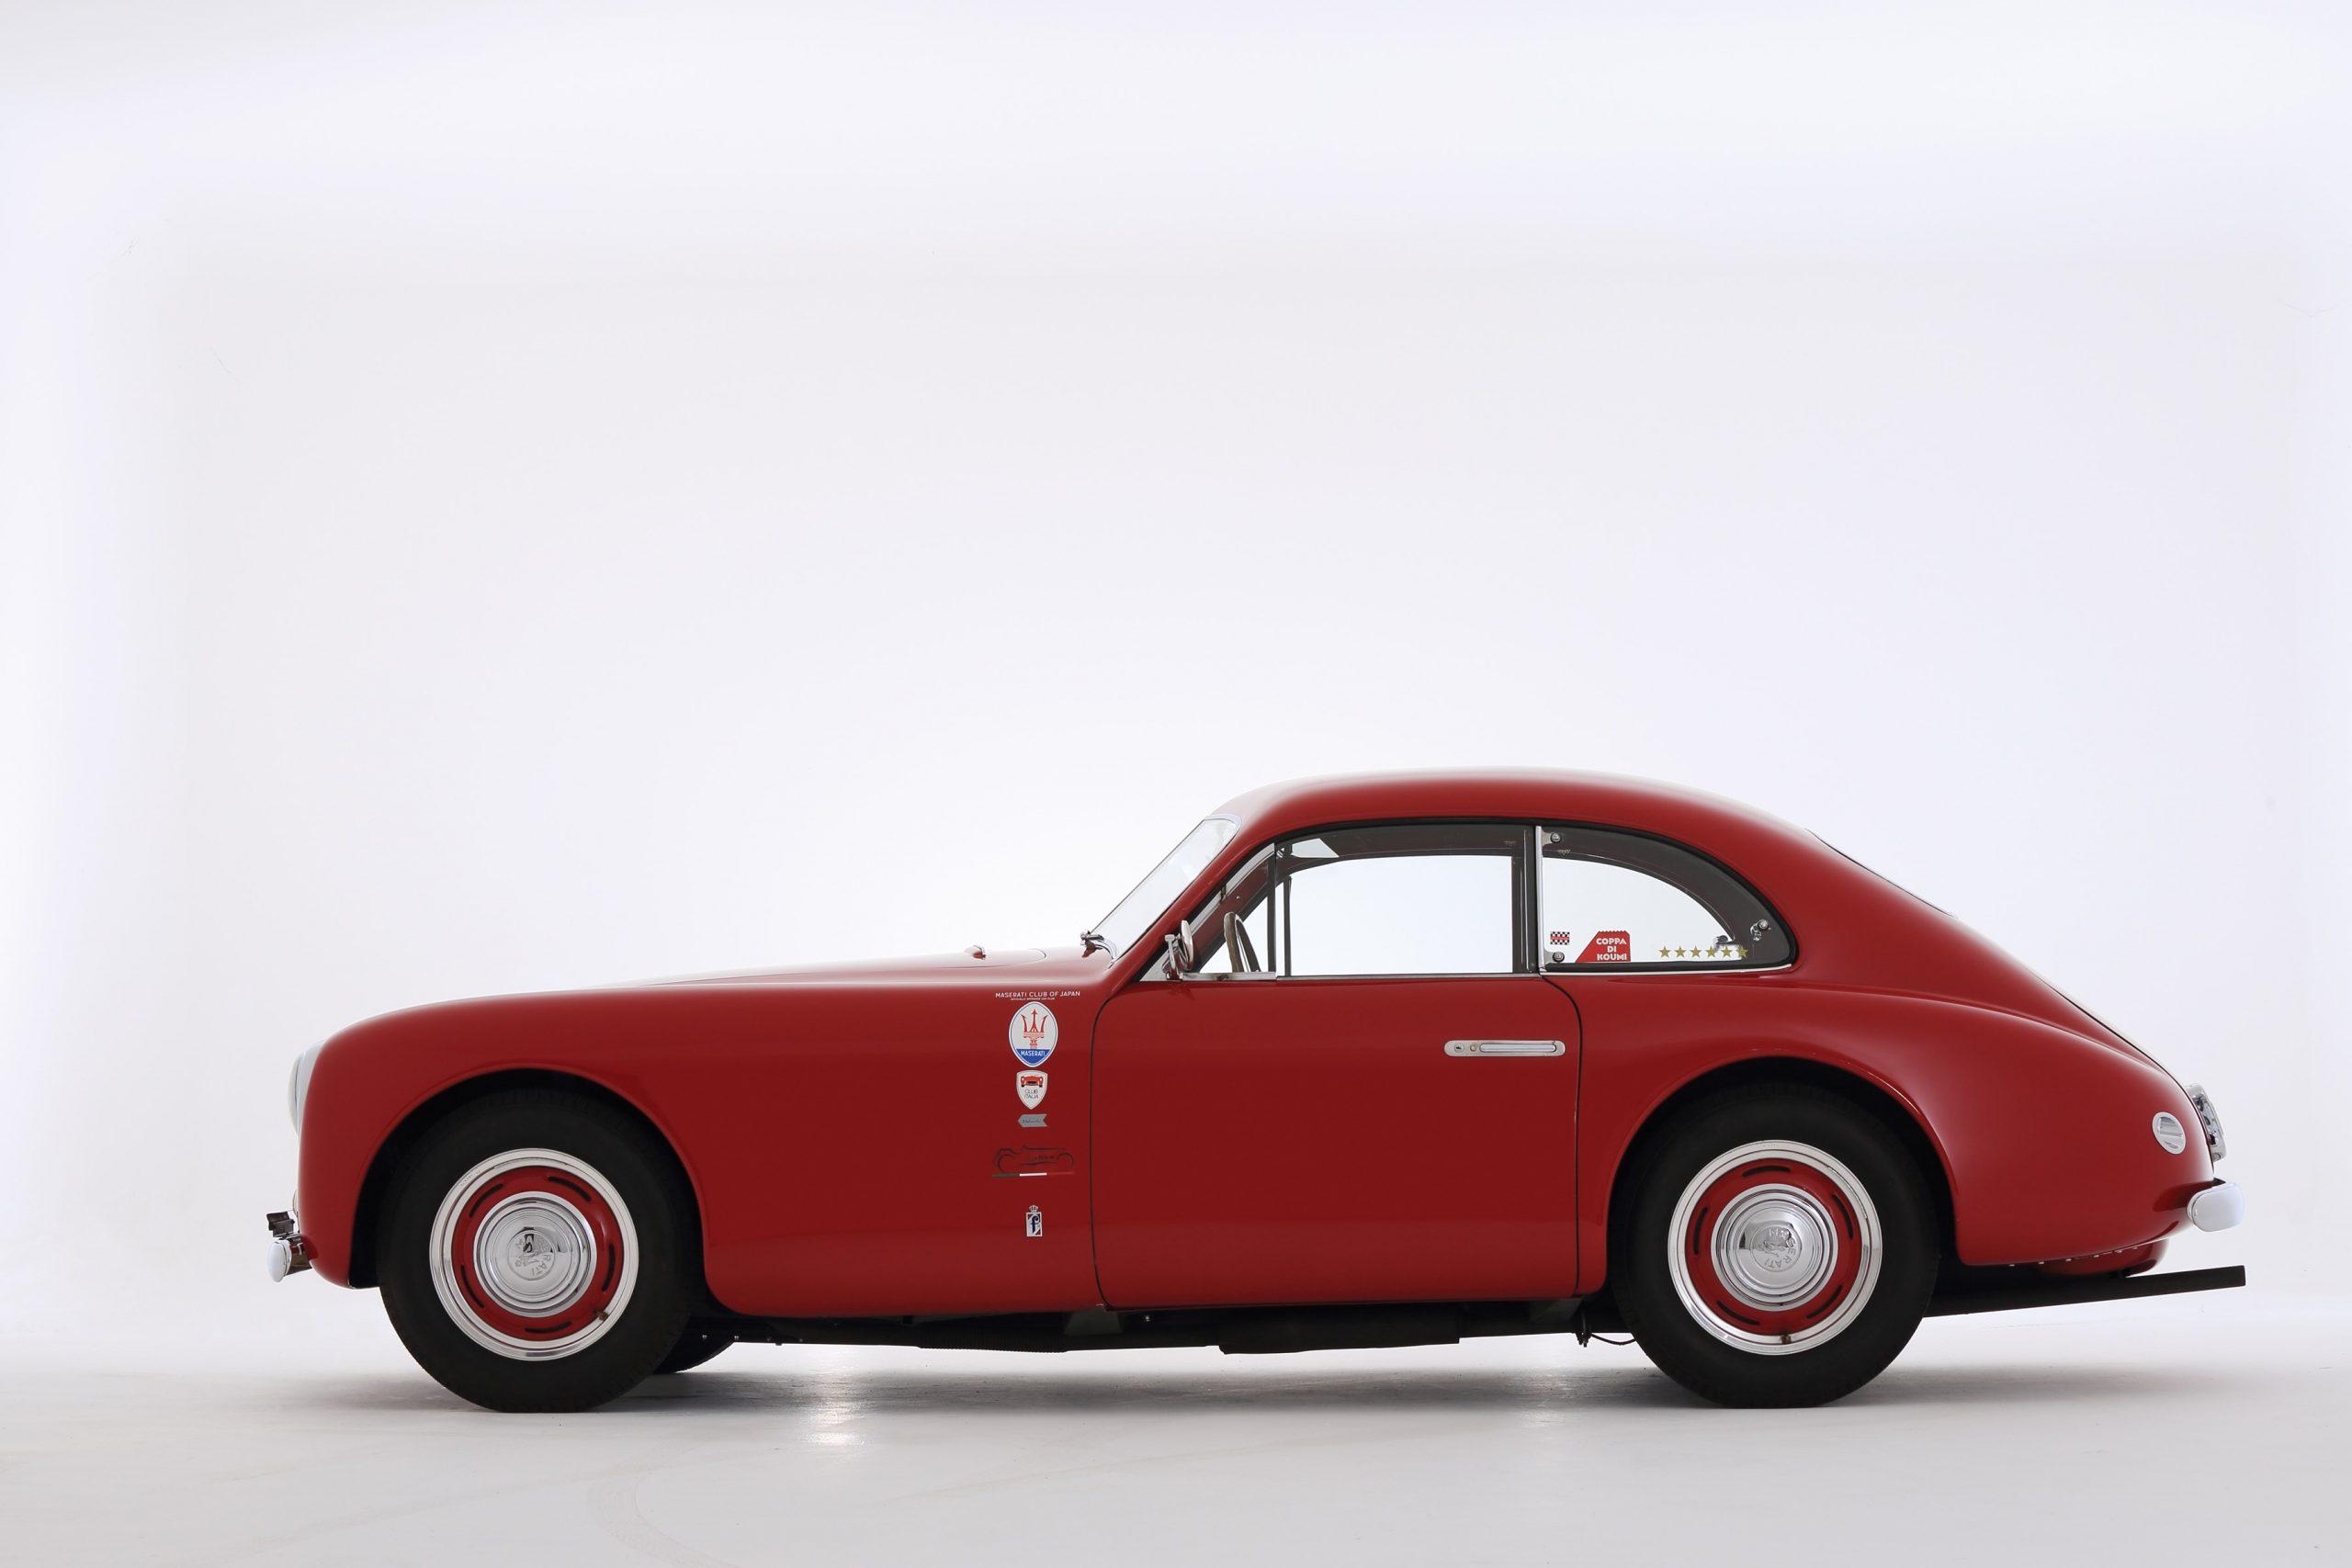 1950 Maserati A6G side profile